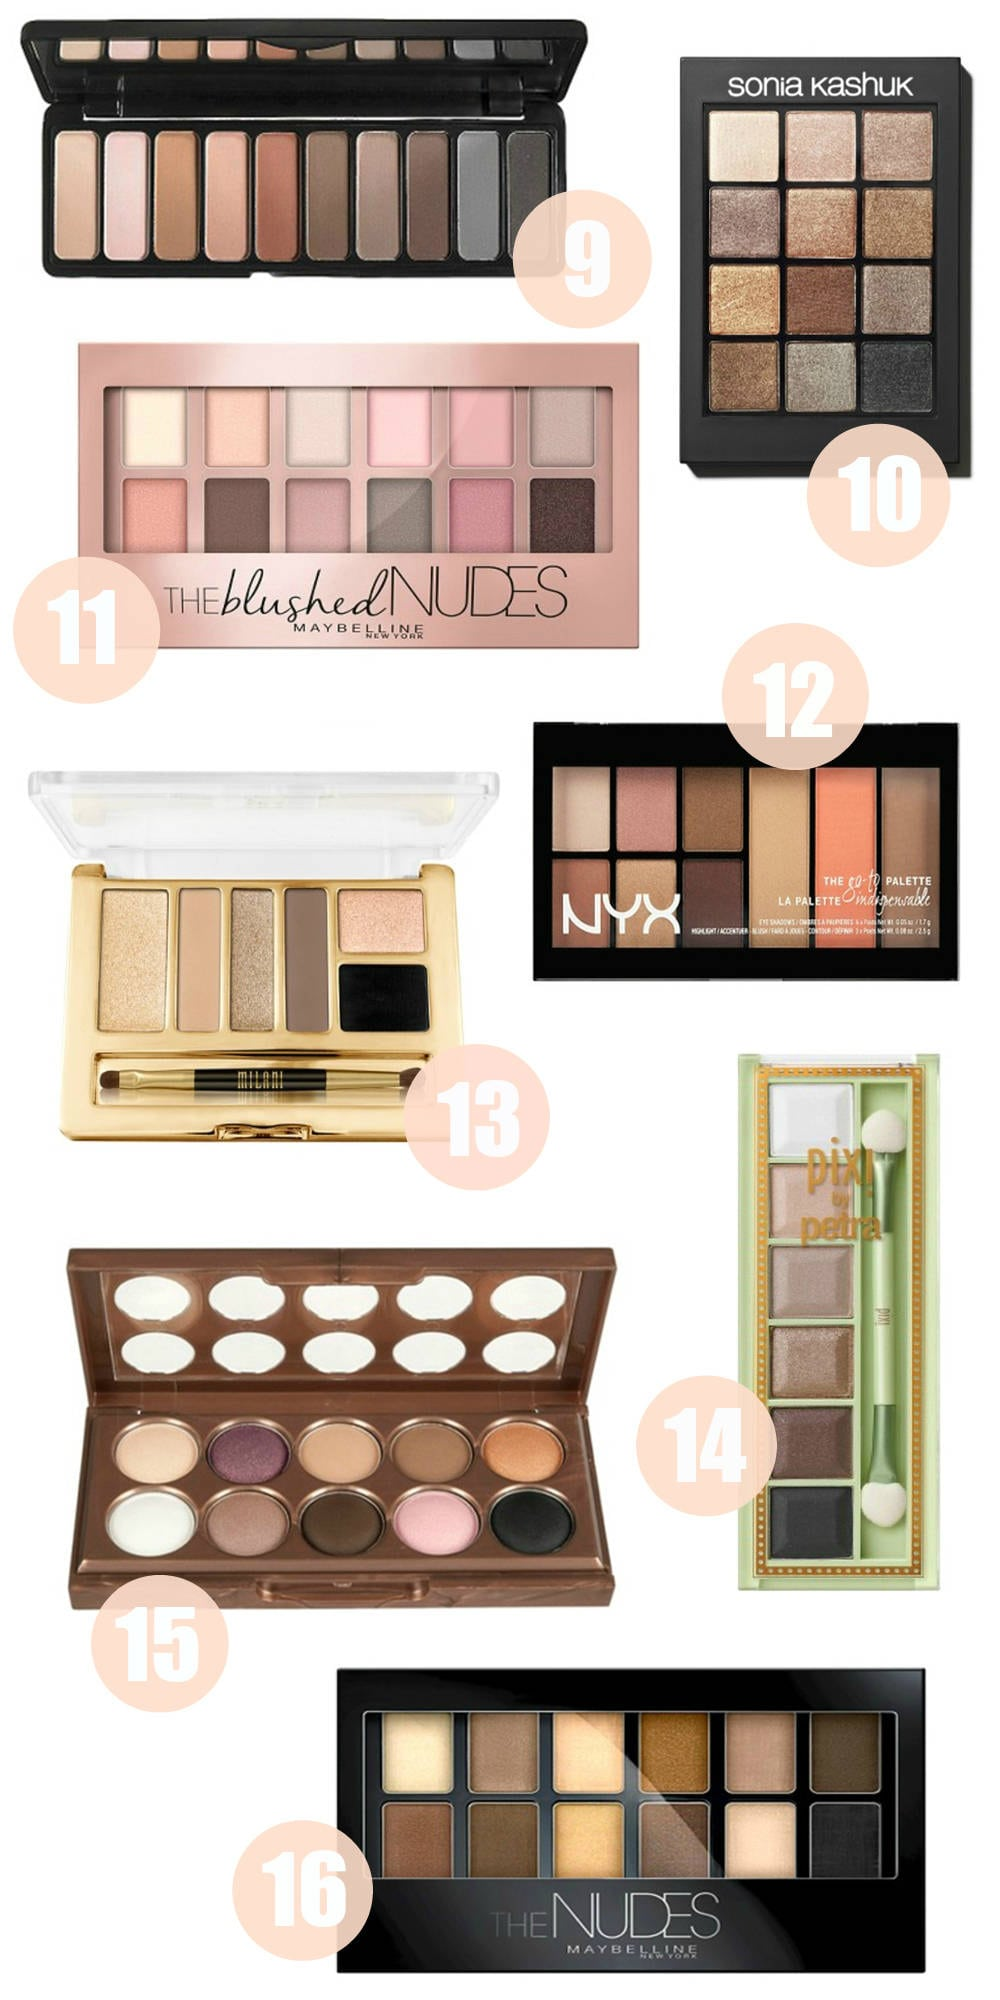 Beauty blogger Mash Elle shares her favorite eyeshadow palettes under $20 - The Best Drugstore Eyeshadow Palettes Under $20 by popular Orlando beauty blogger Mash Elle